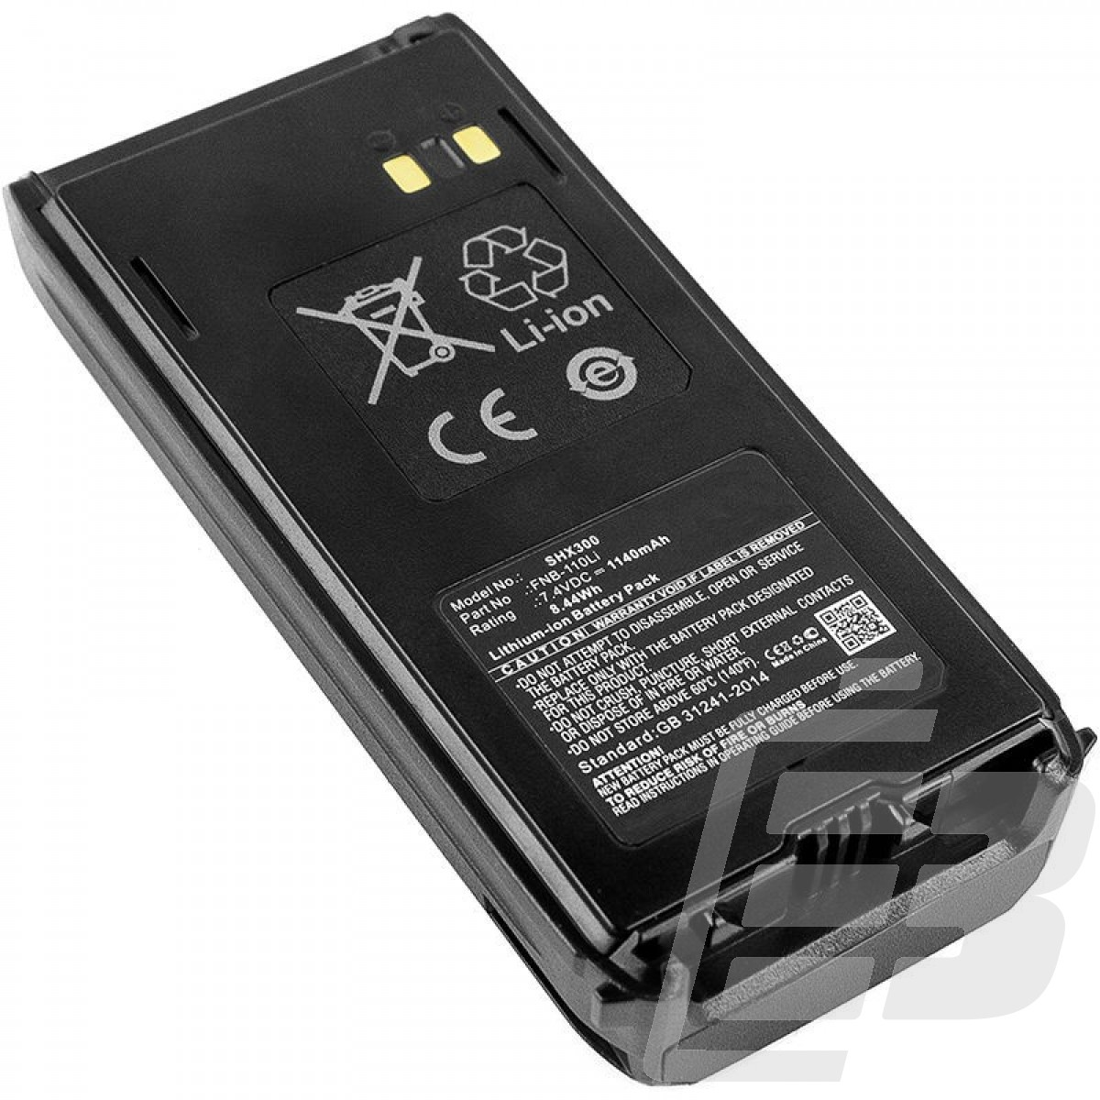 Two-Way radio battery Standard Horizon HX290_1